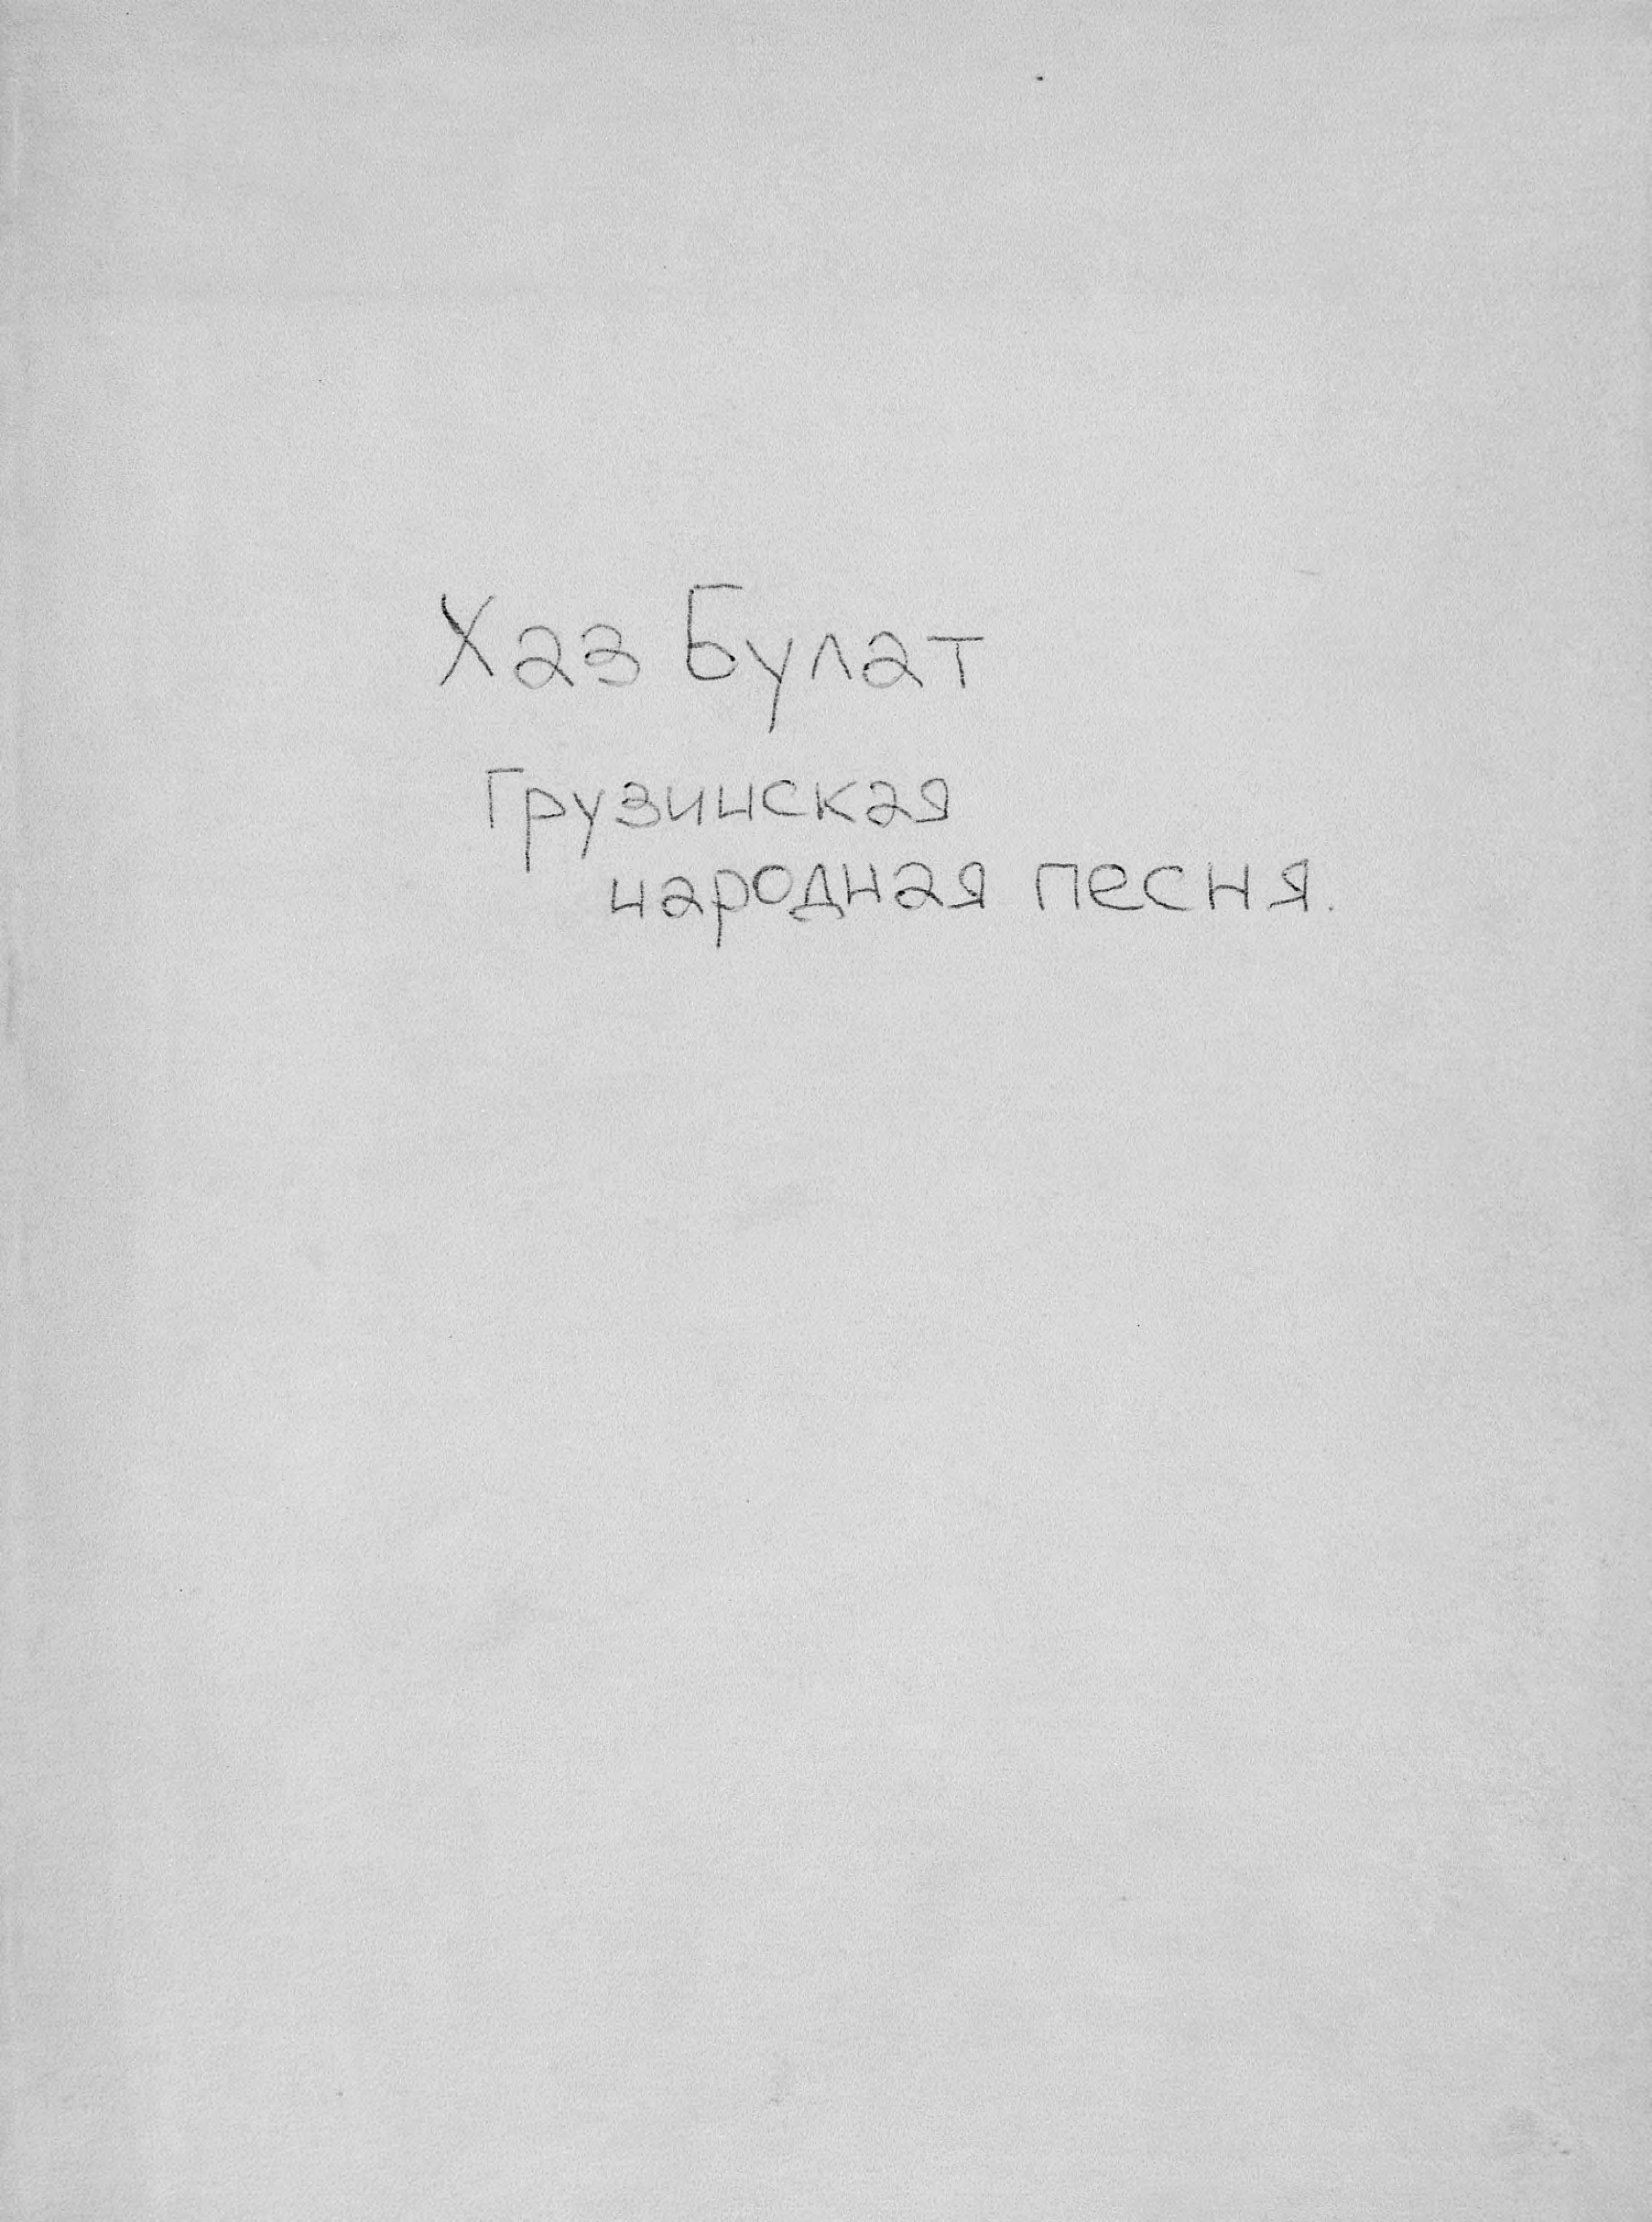 Народное творчество Хаз-Булат русское народное творчество